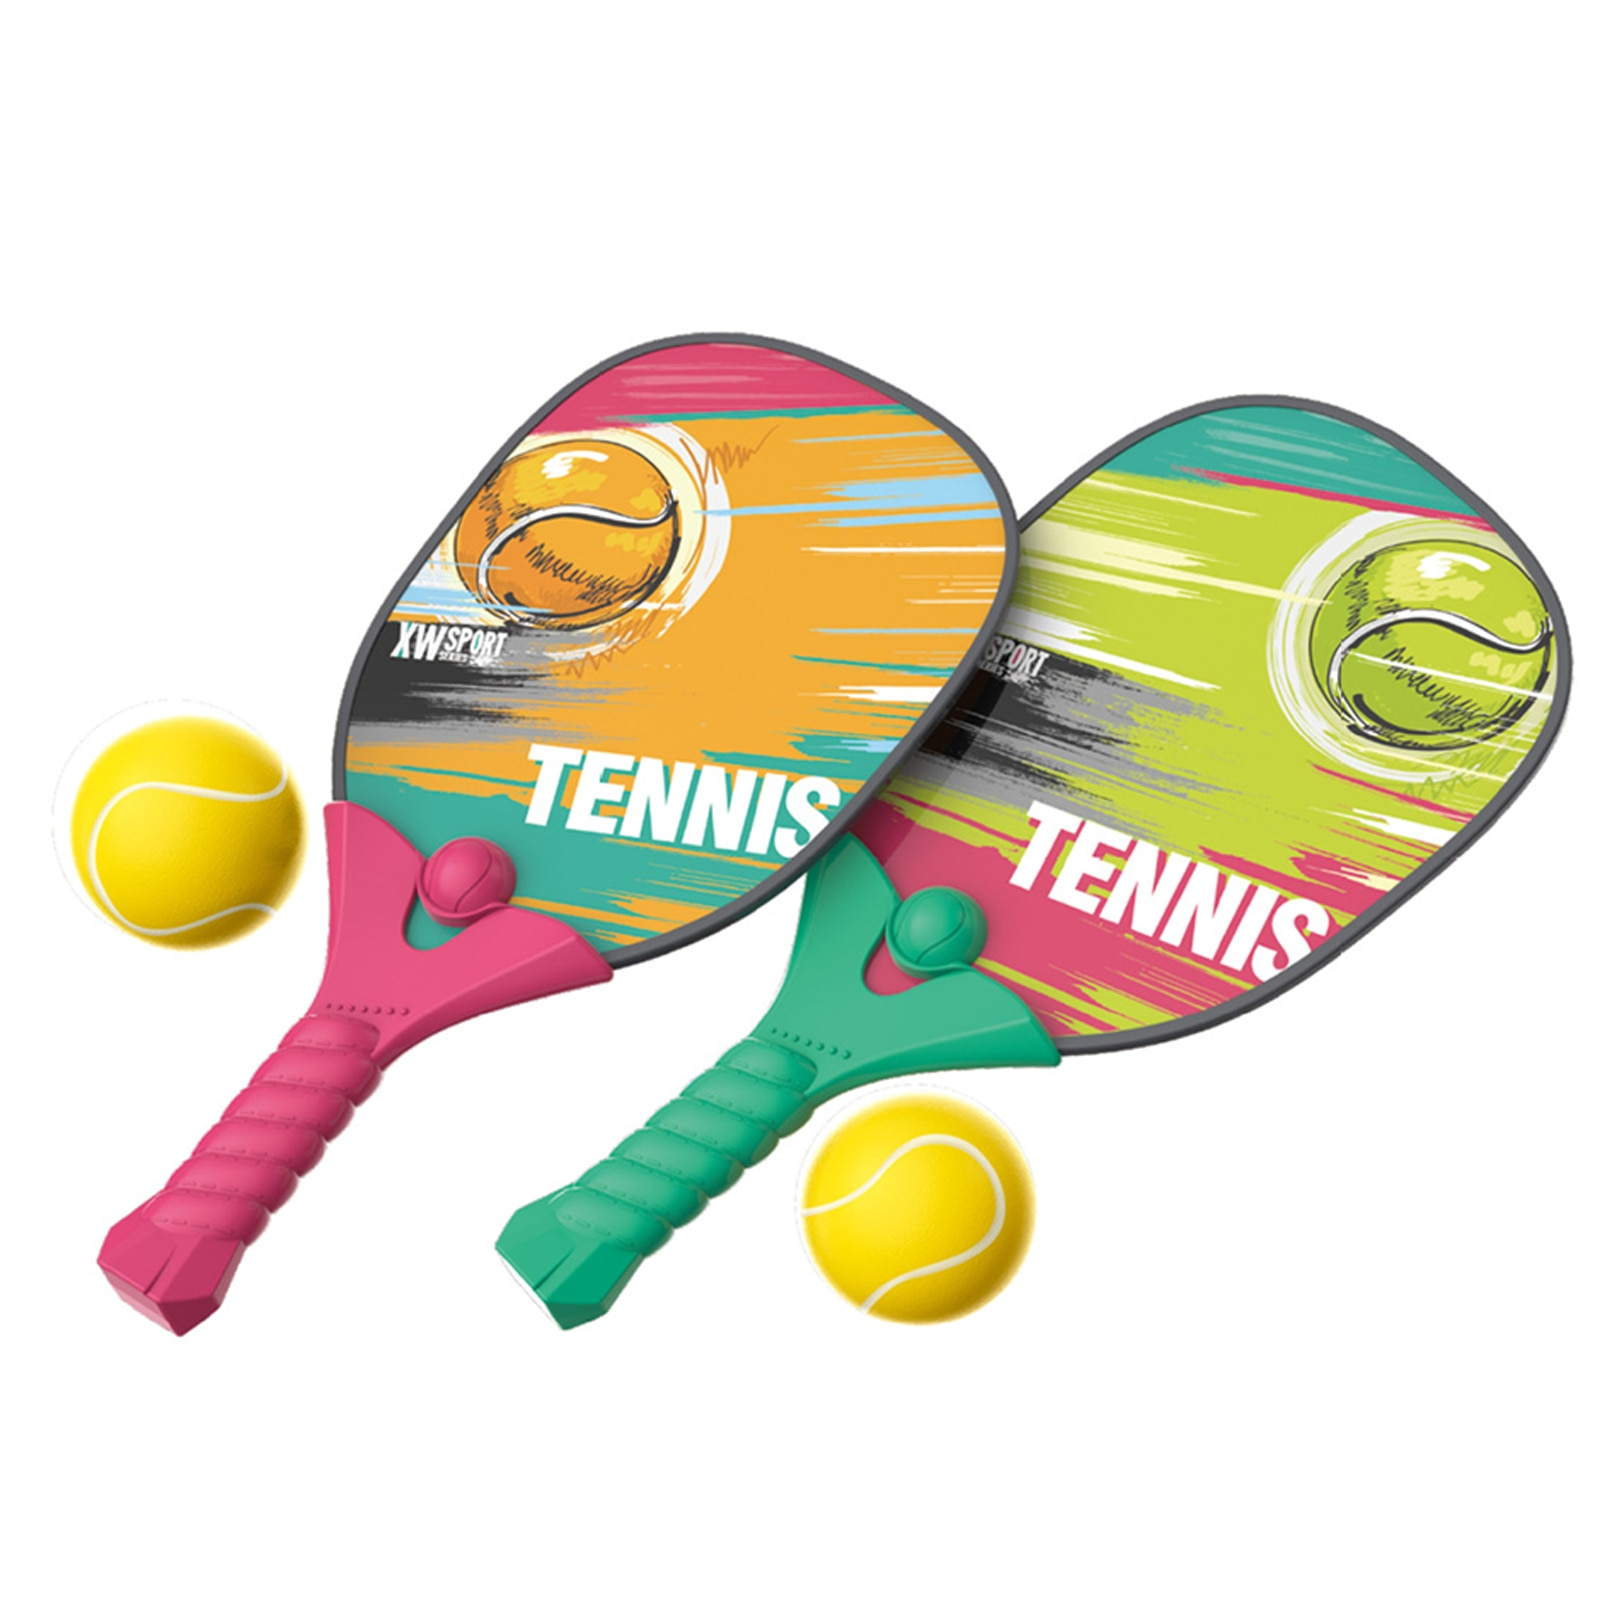 Kids Beach Tennis Paddle Racket with Balls Pickleball Racket Set Safe Outdoor Beach Play Sport Toys for Children